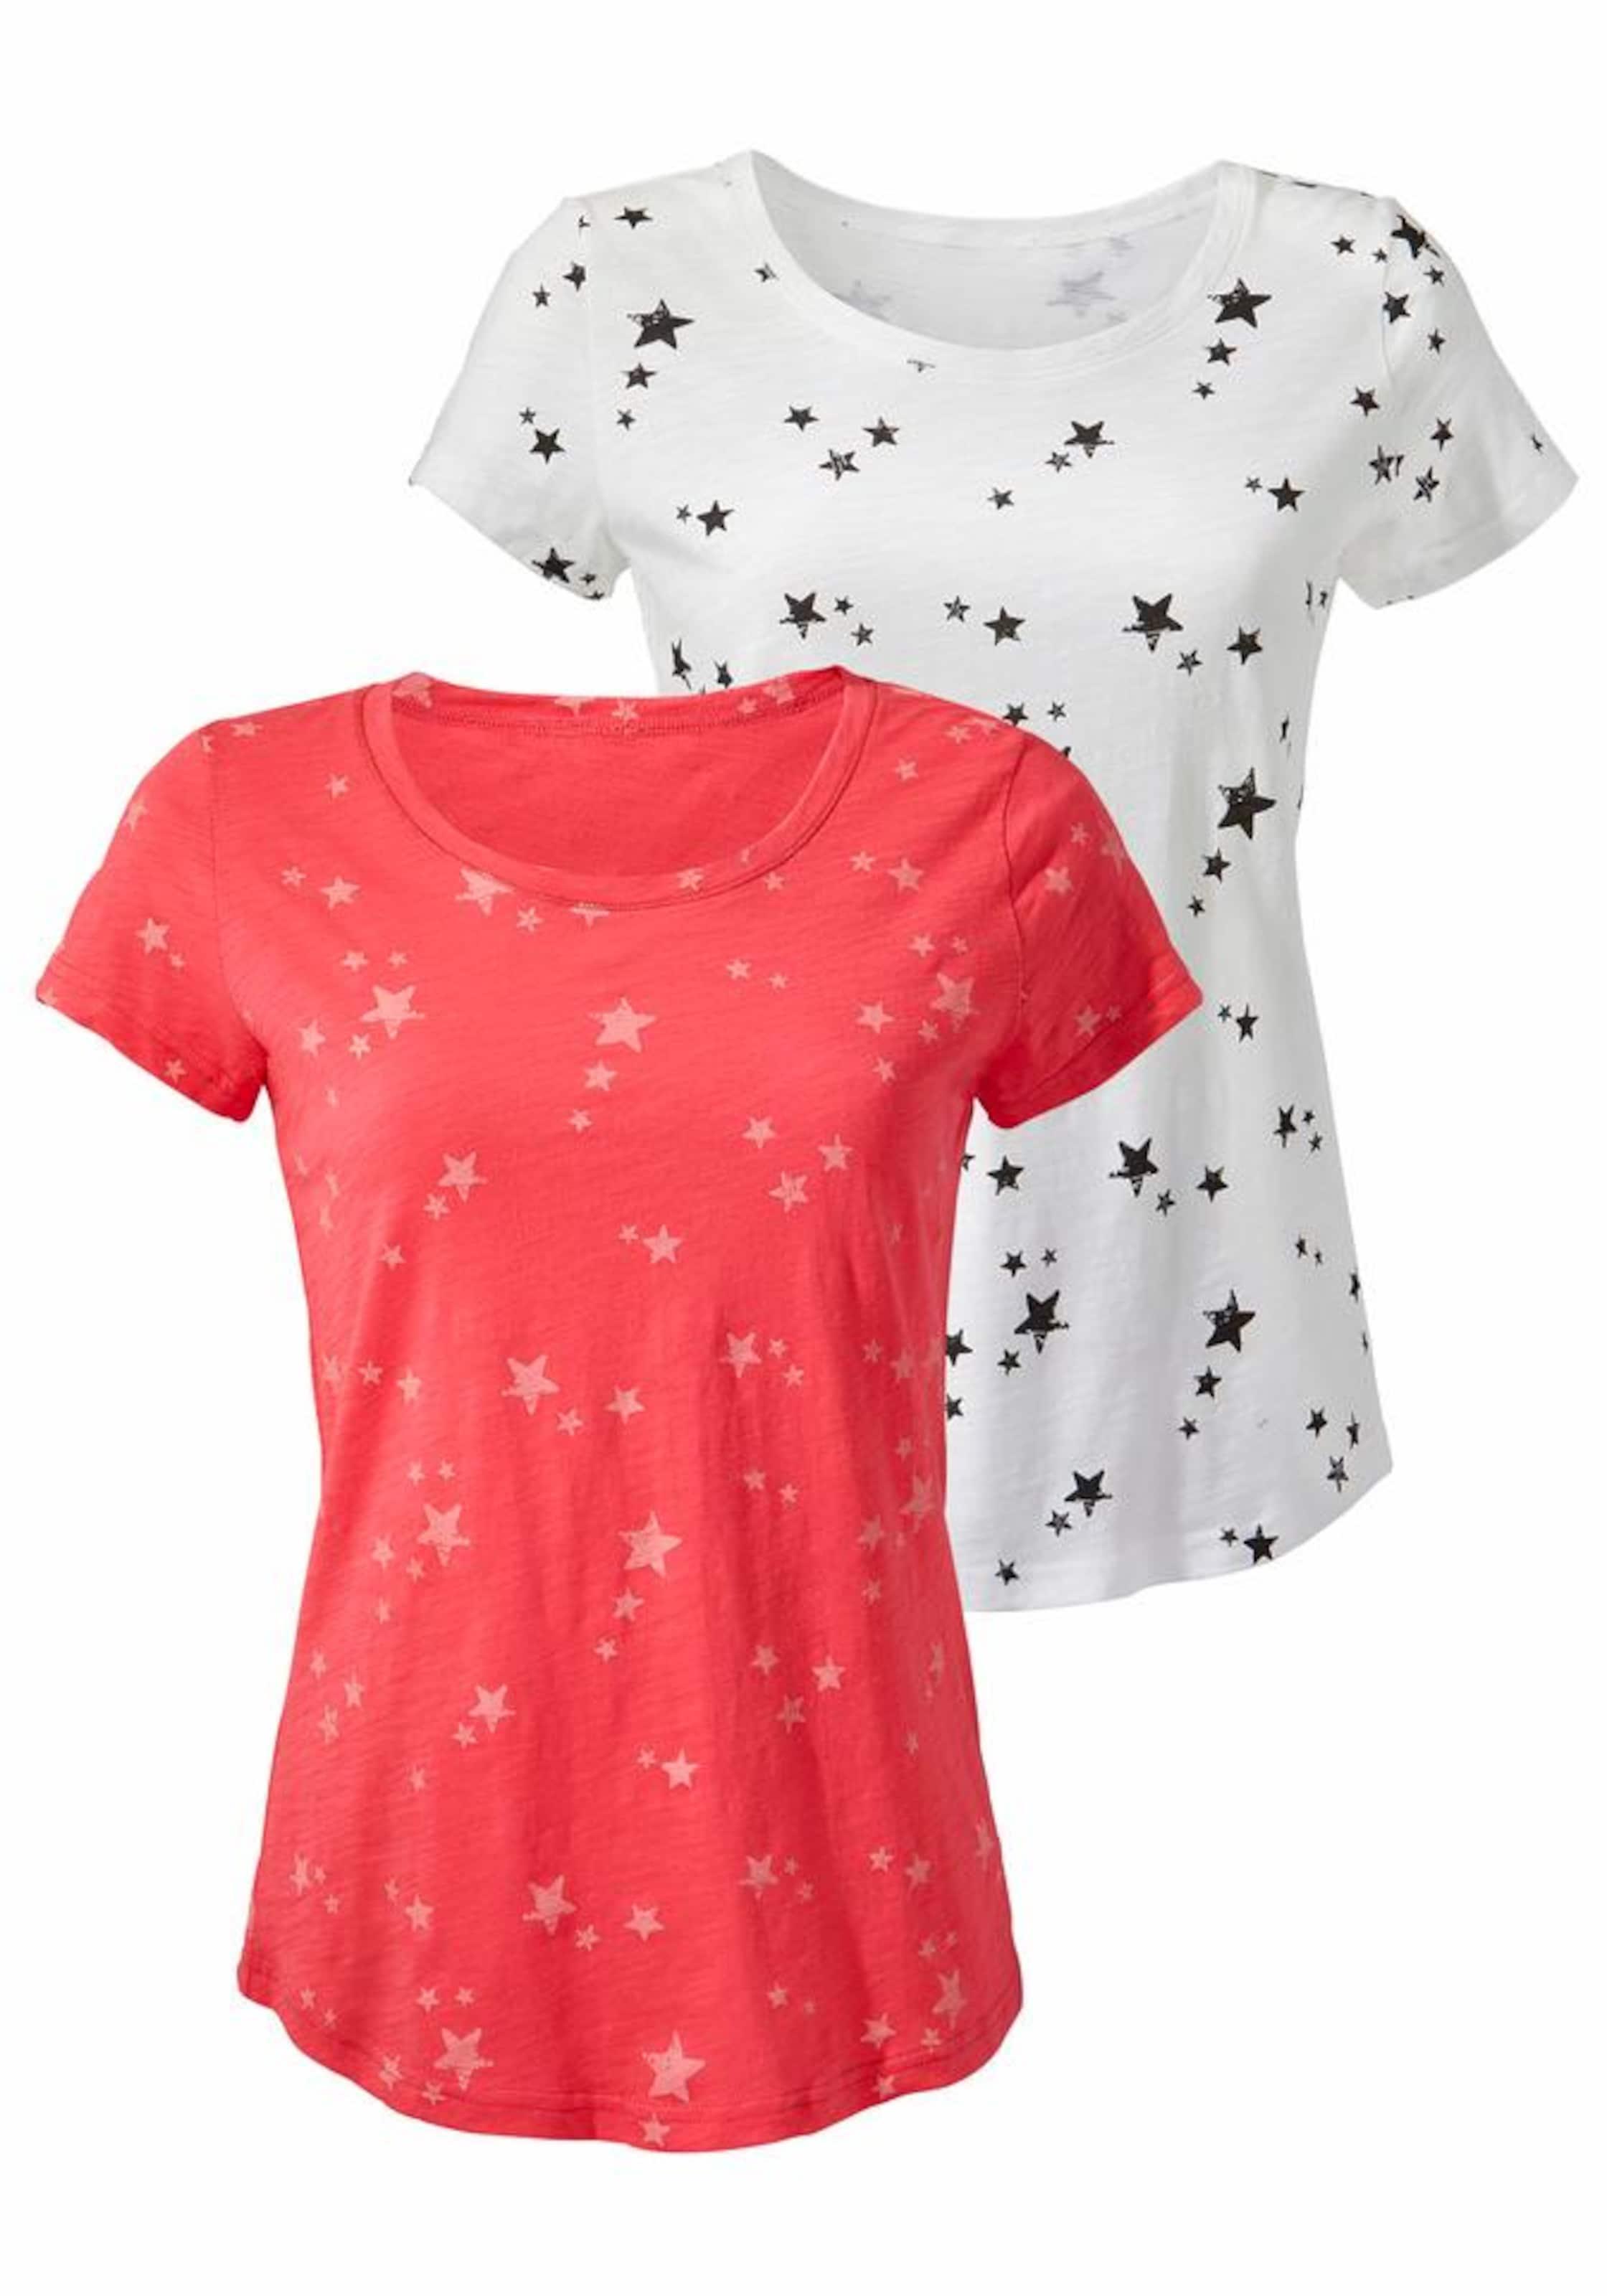 T T KoralleWeiß Vivance StückIn Vivance Vivance StückIn shirt2 shirt2 KoralleWeiß IYWHD29eEb